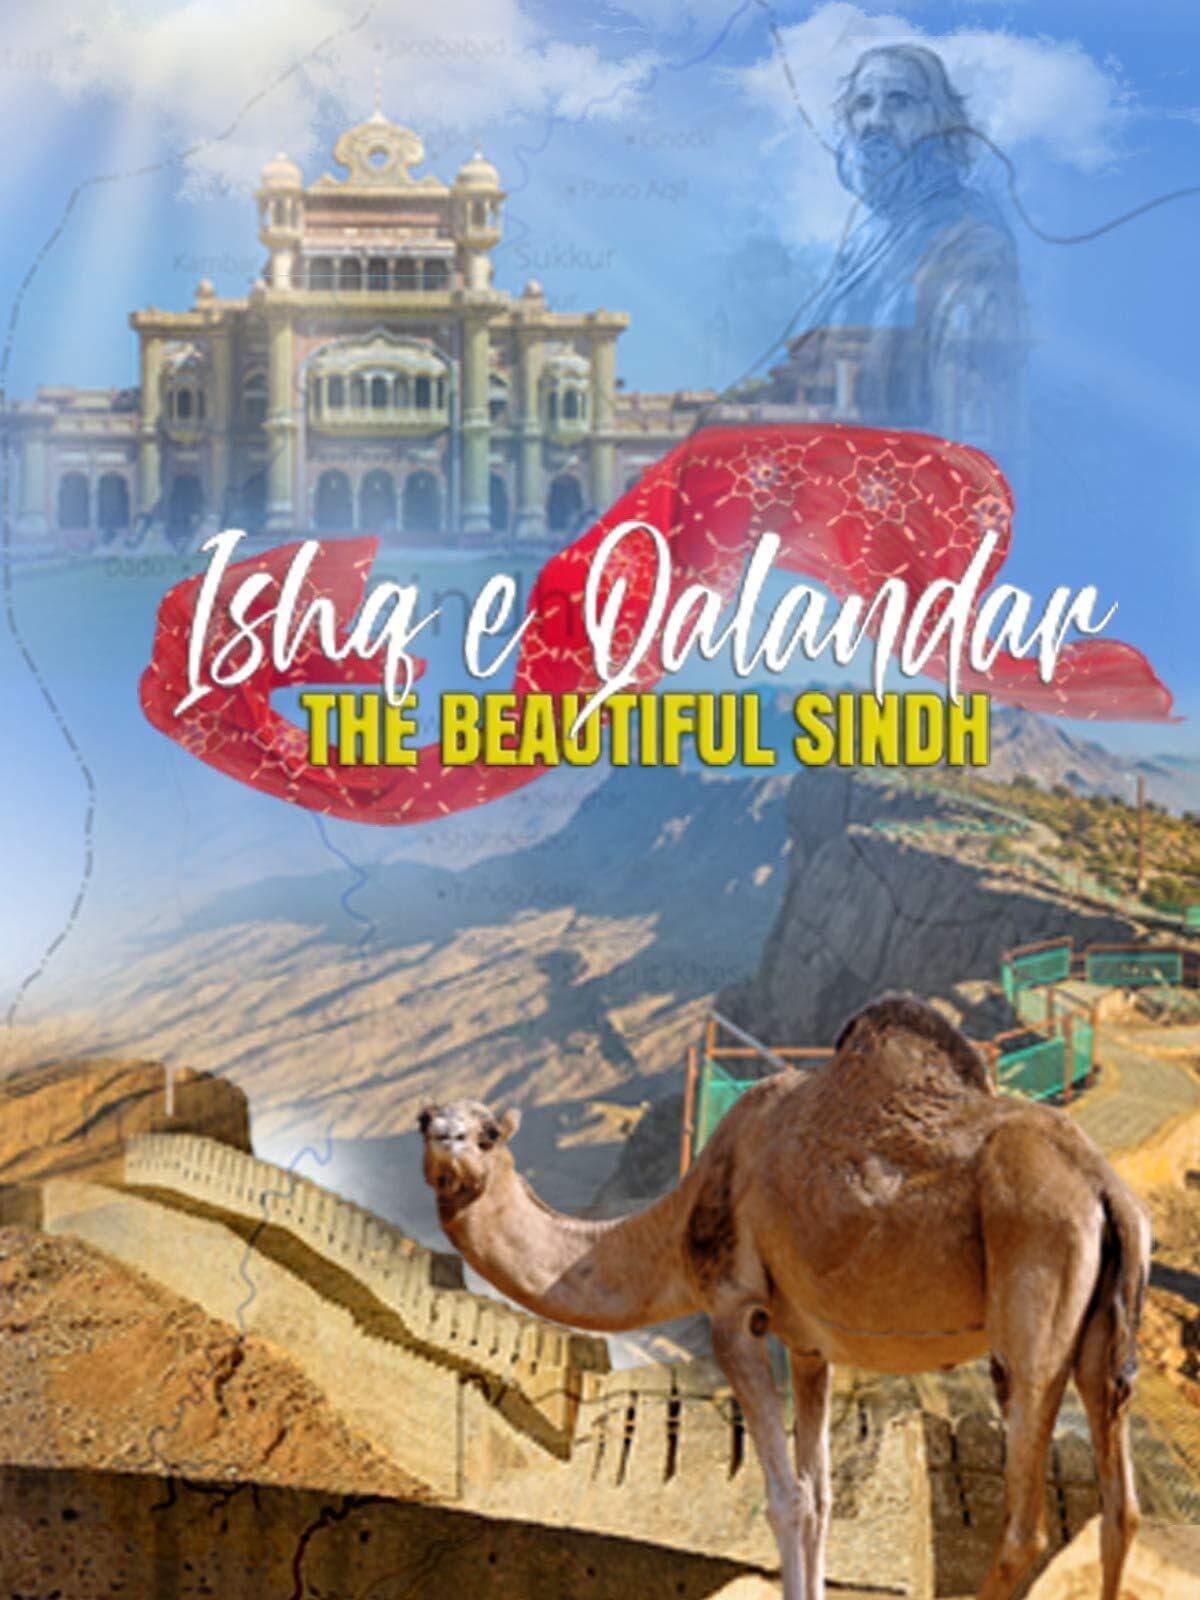 Ishq e Qalandar - The Beautiful Sindh